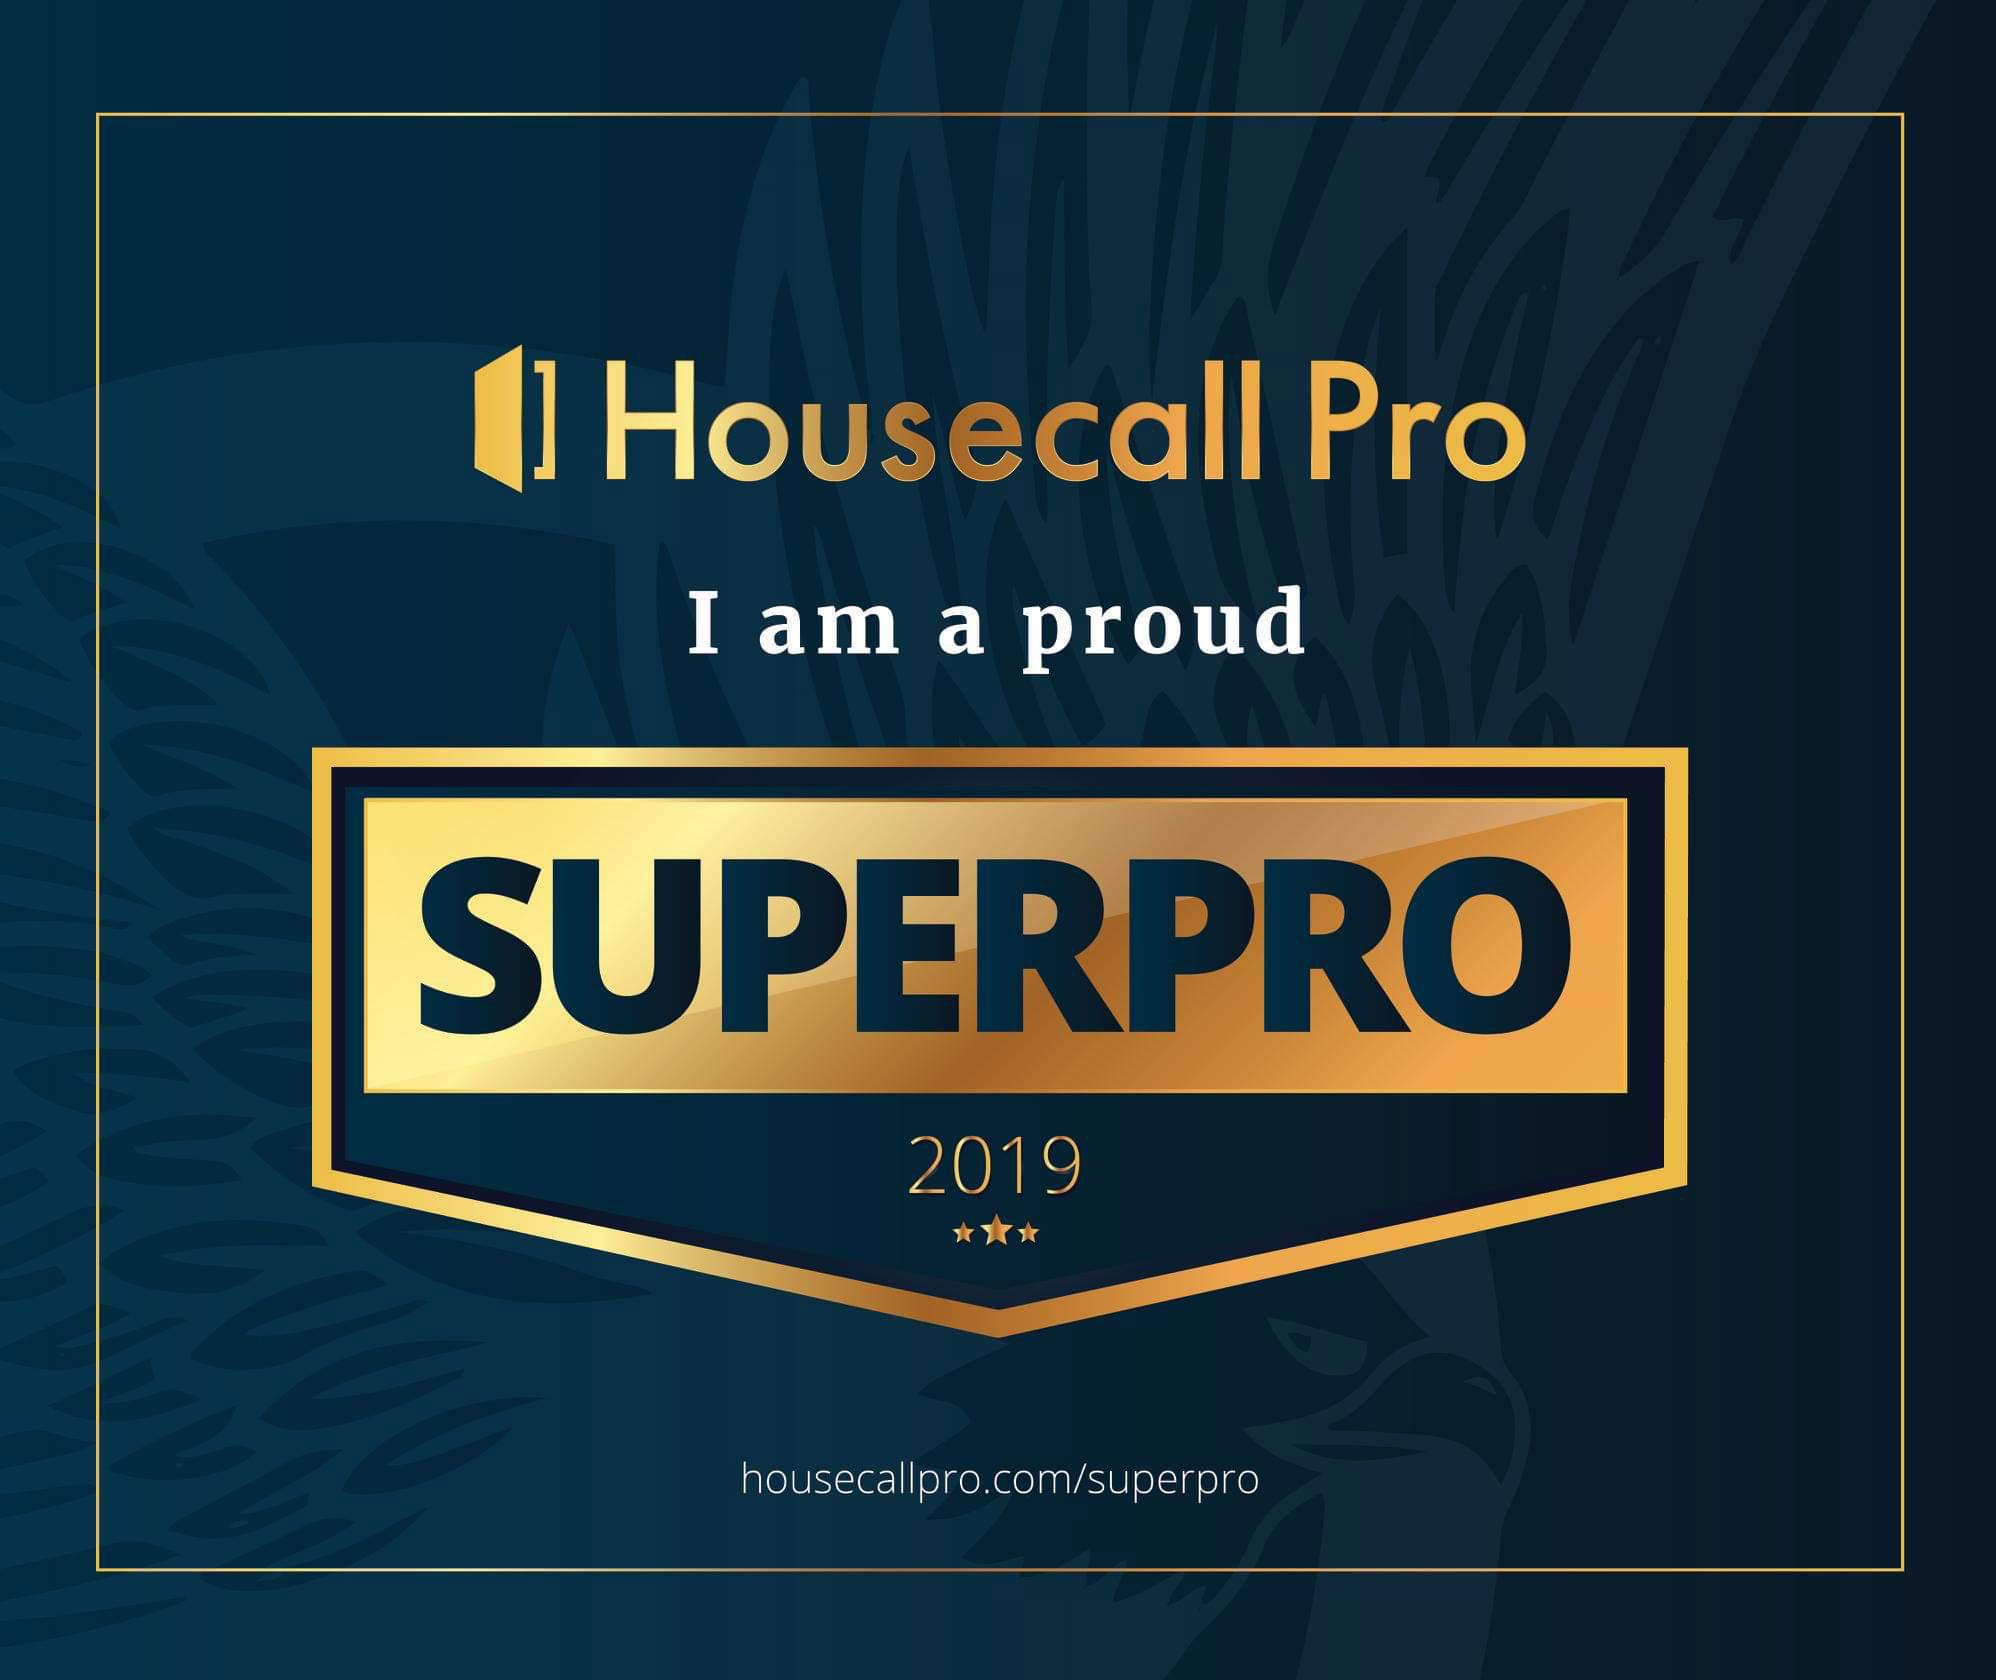 Enviro Plumbing are a Housecall Pro Superpro of 2019